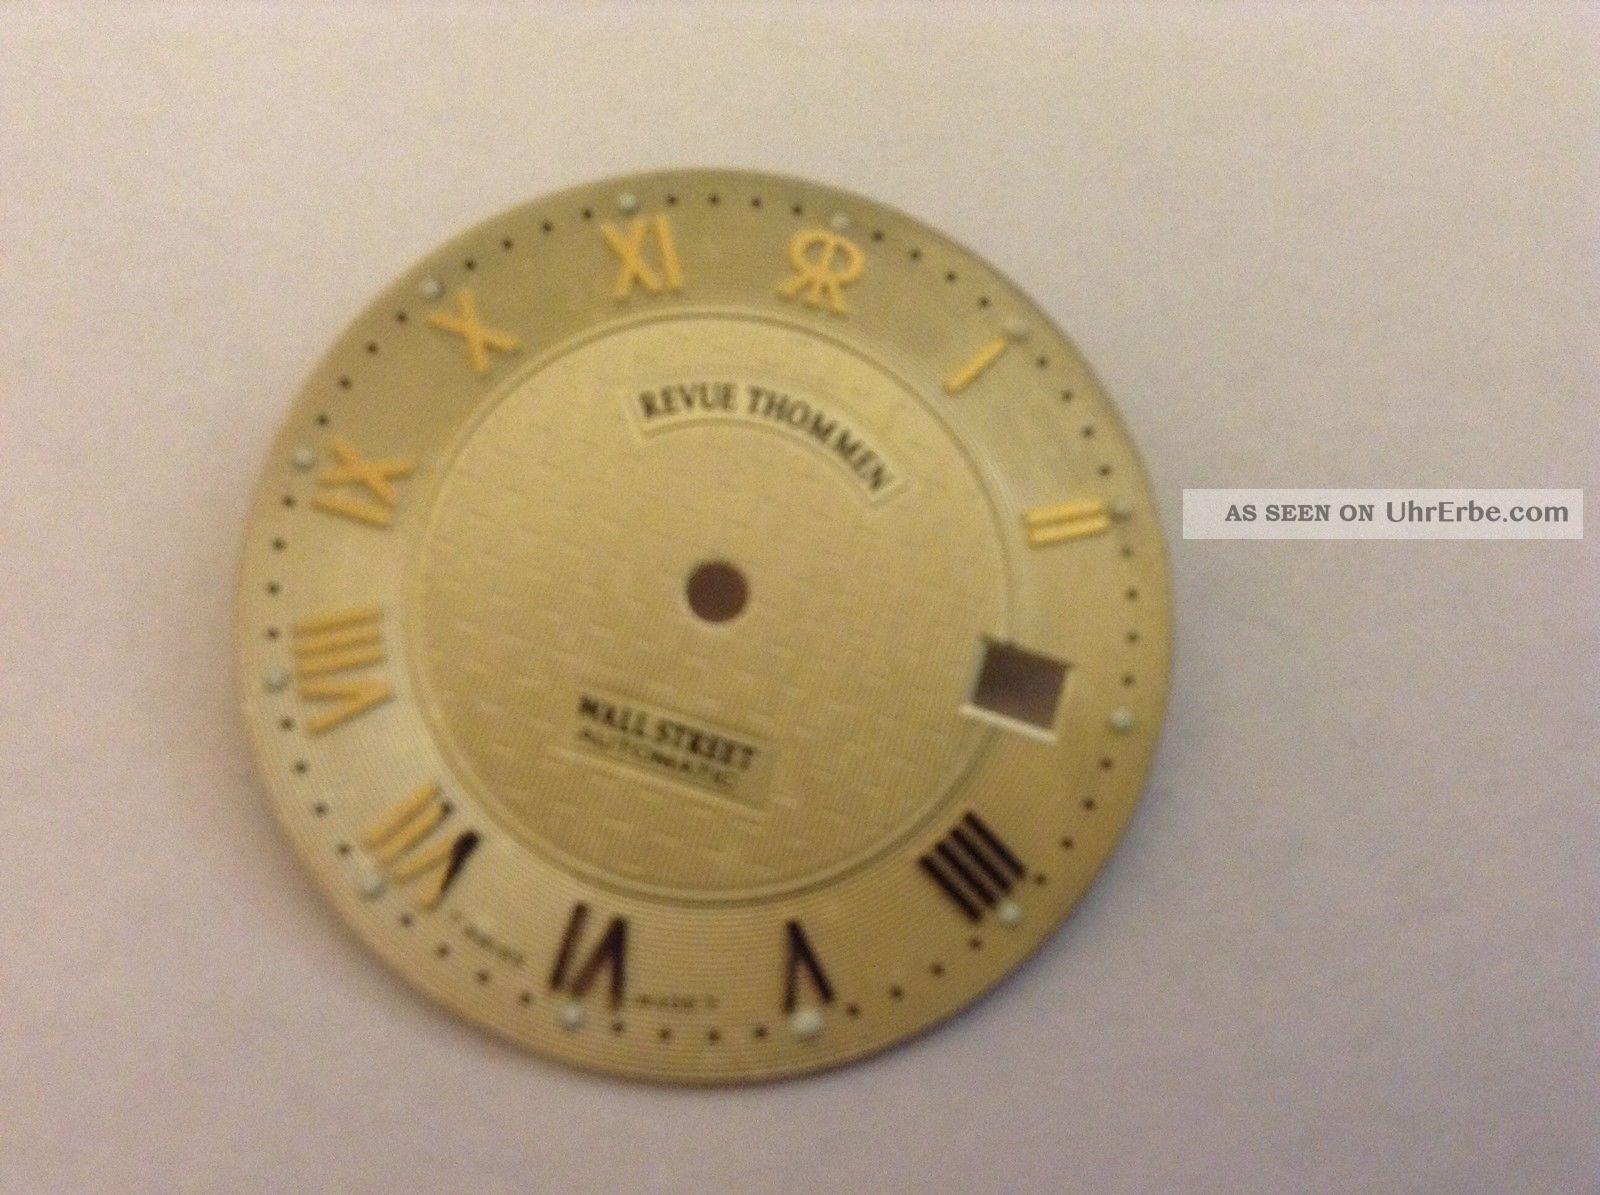 Revue Thommen Wall Street Automatic Zifferblatt Armbanduhren Bild